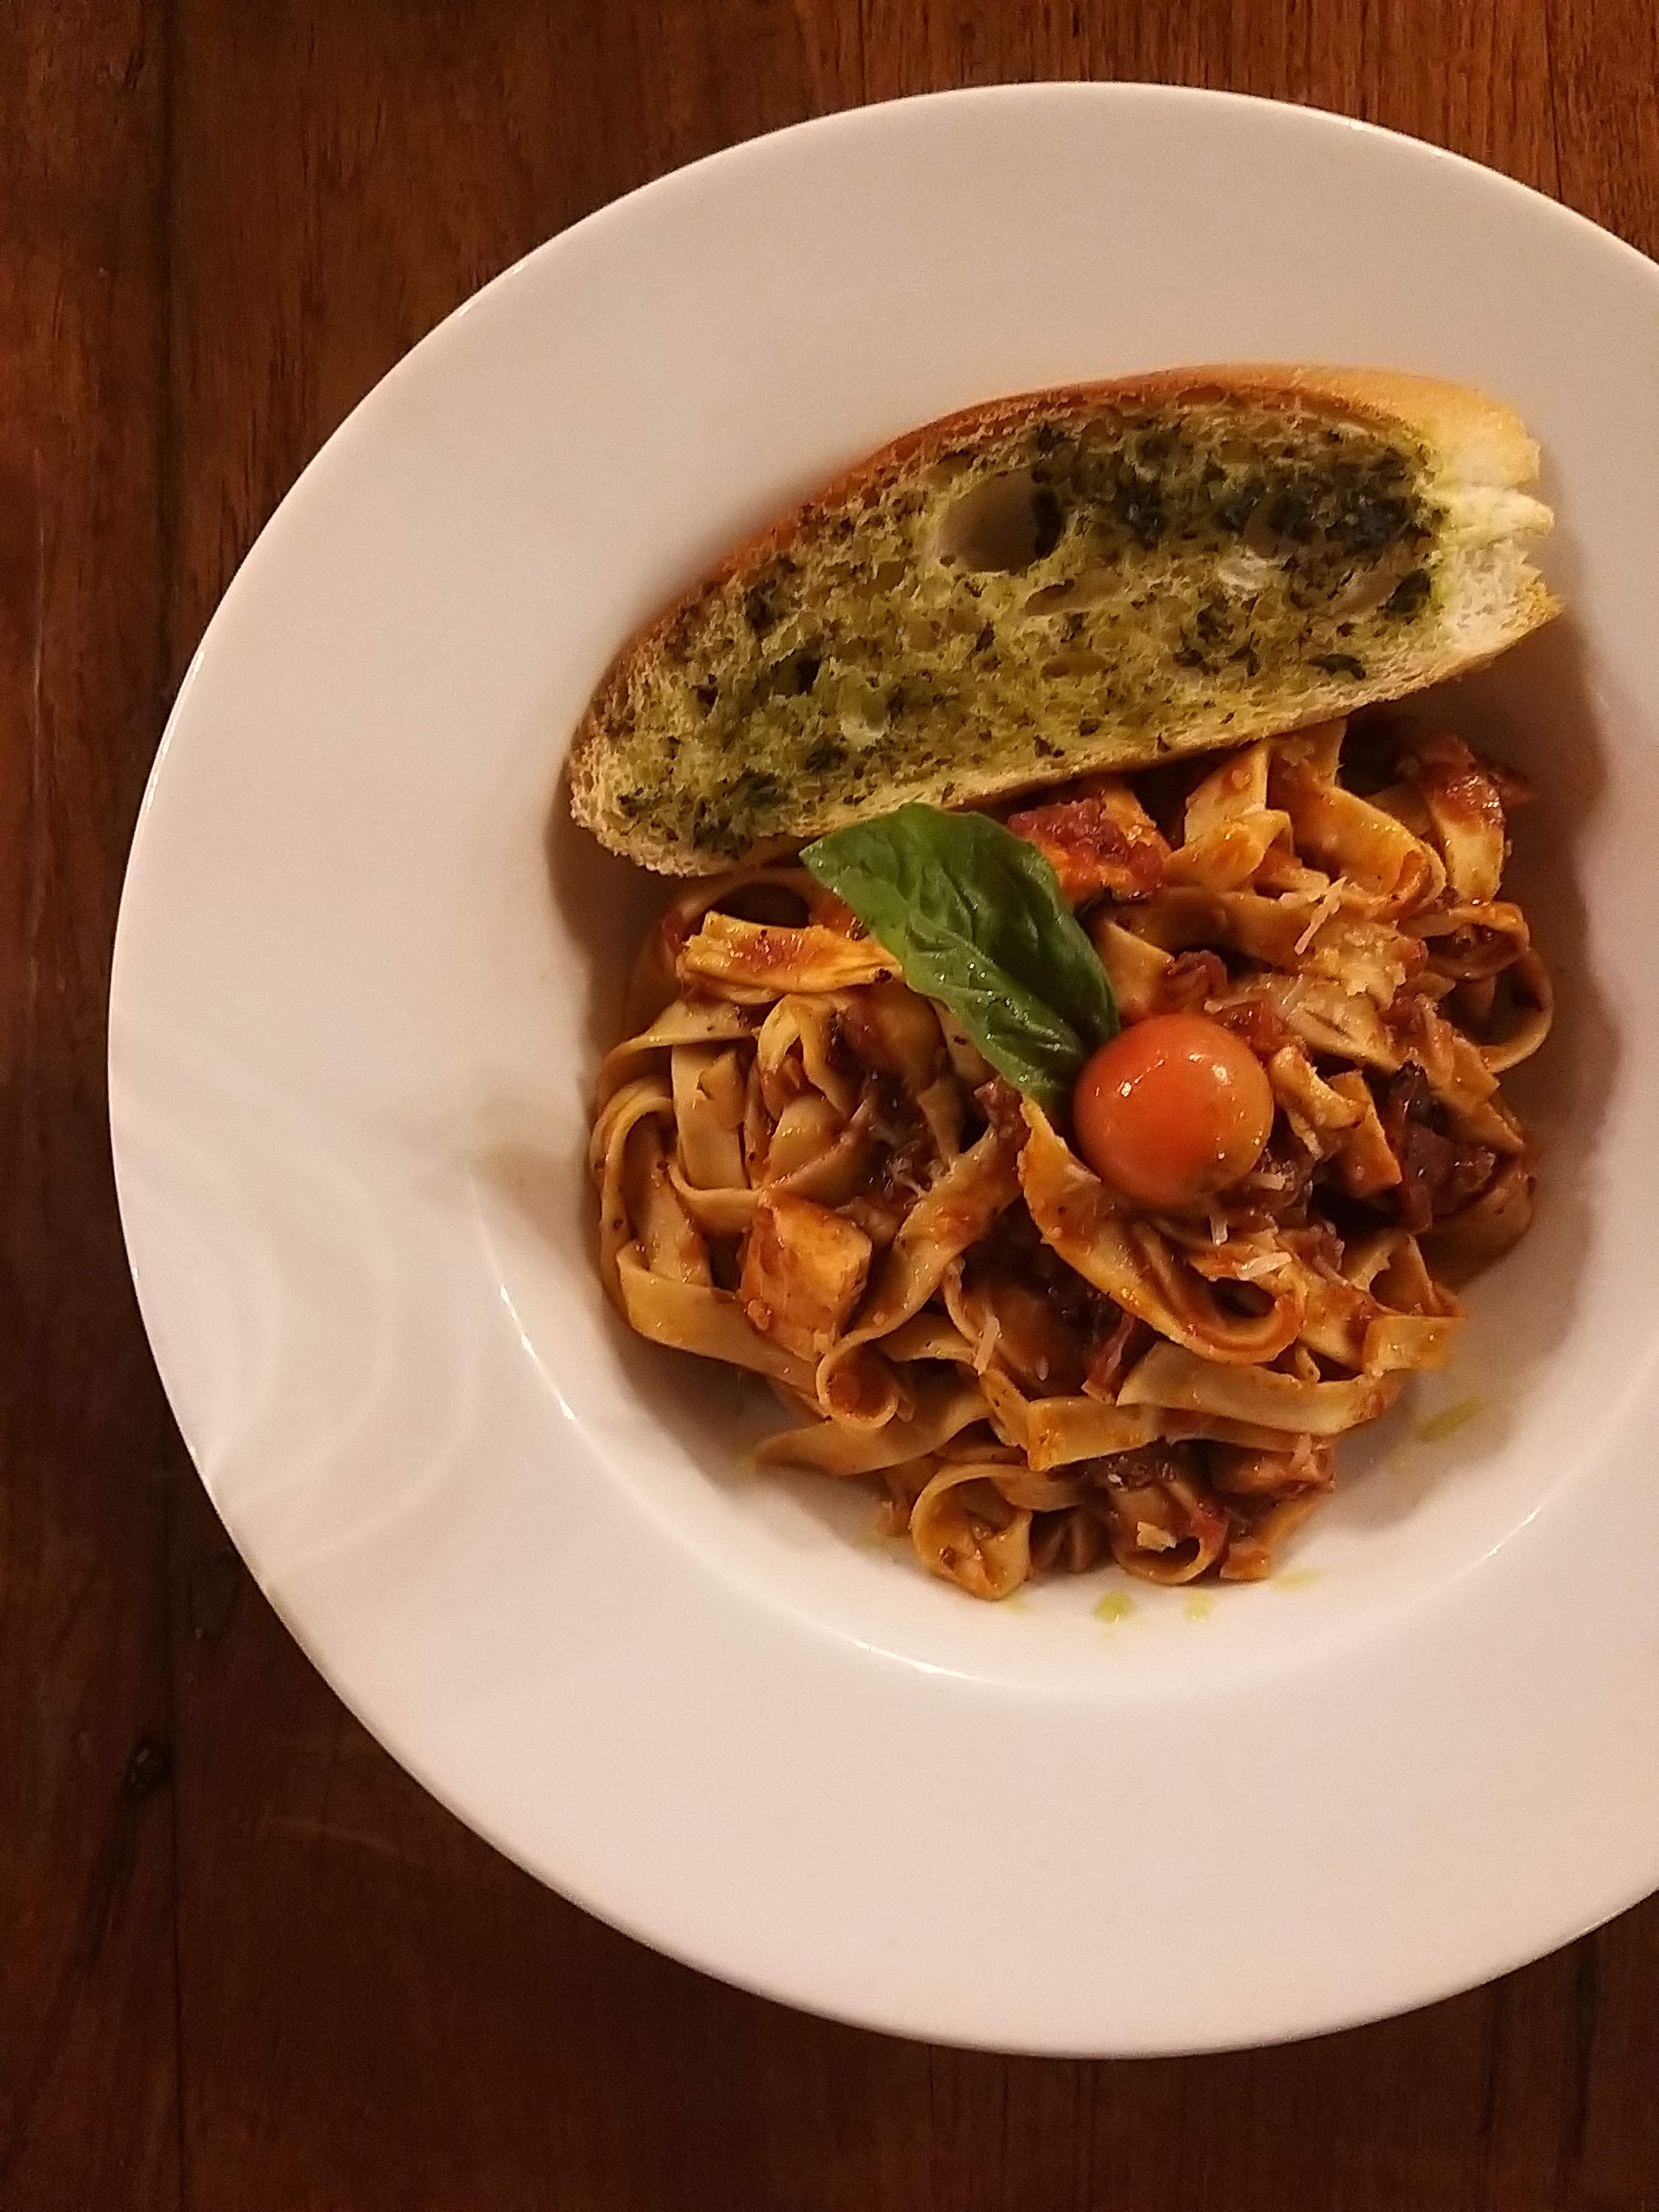 Cuisine,Food,Dish,Ingredient,Spaghetti,Bigoli,Capellini,Taglierini,Italian food,Produce